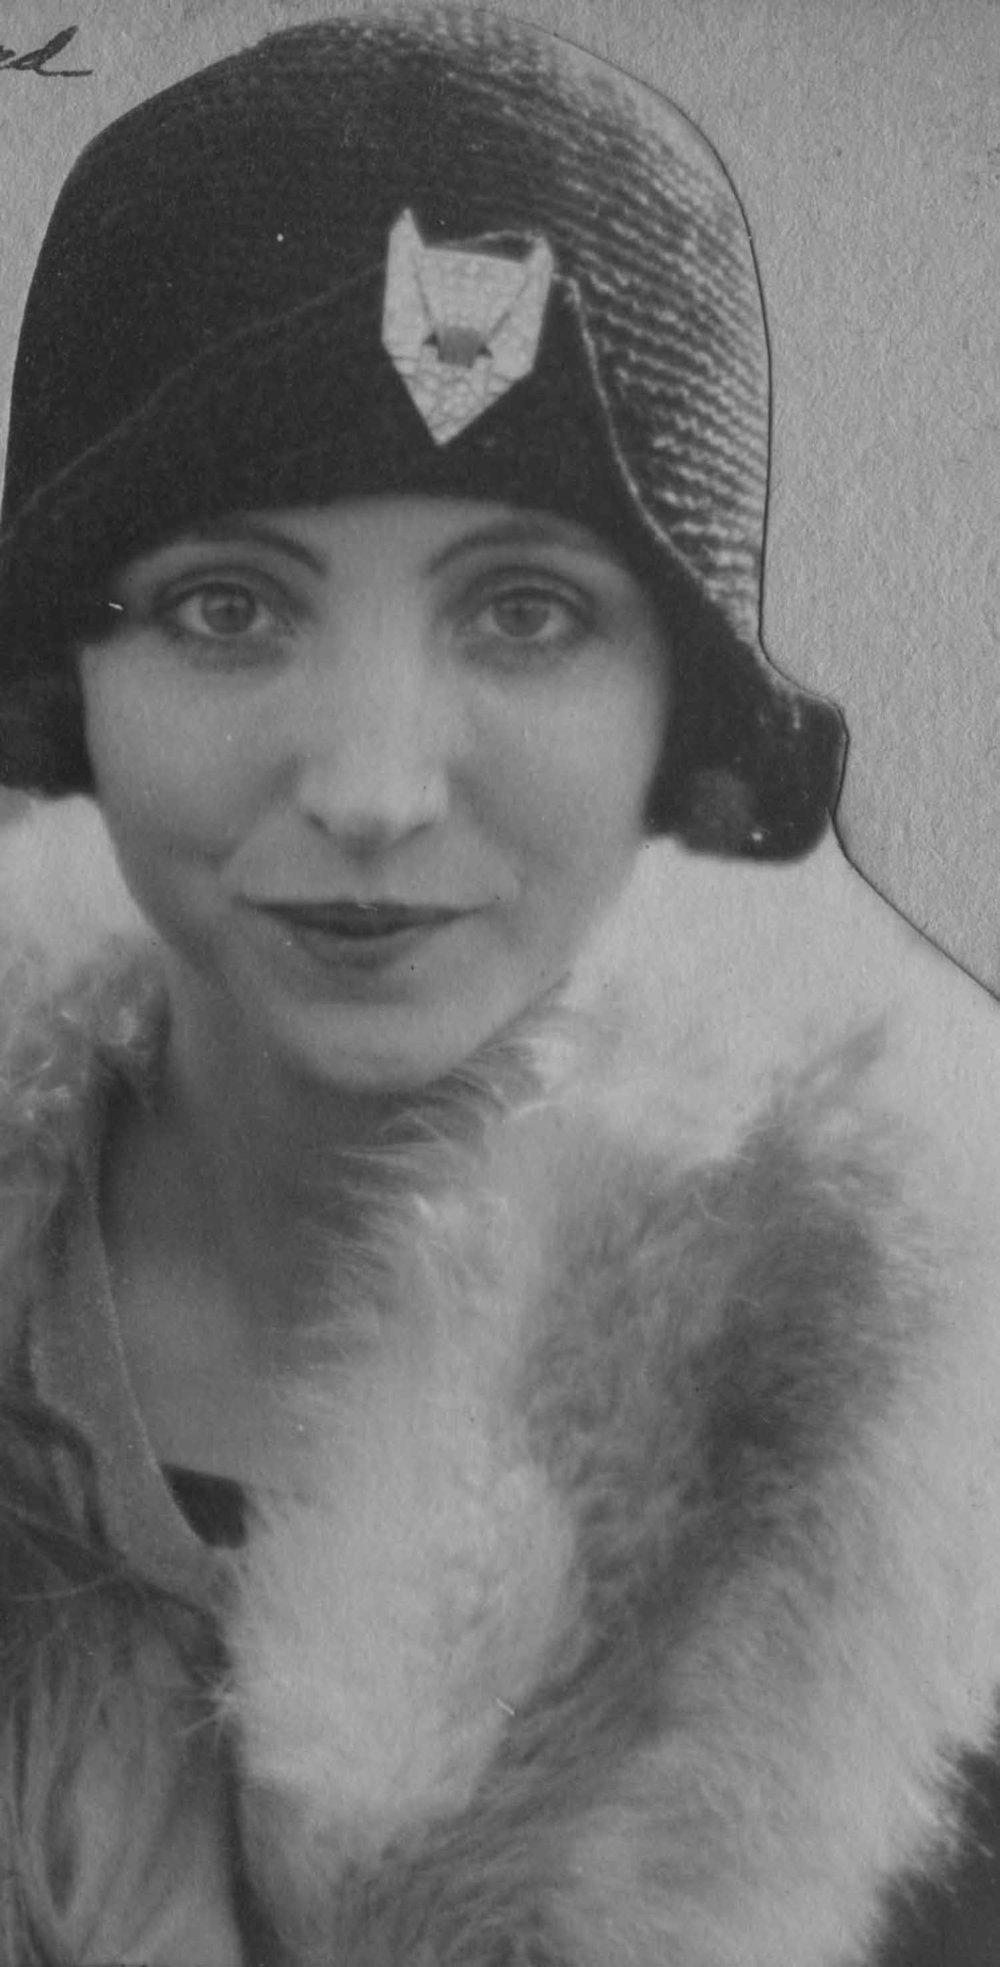 Anais 1928 4 May NY.jpg